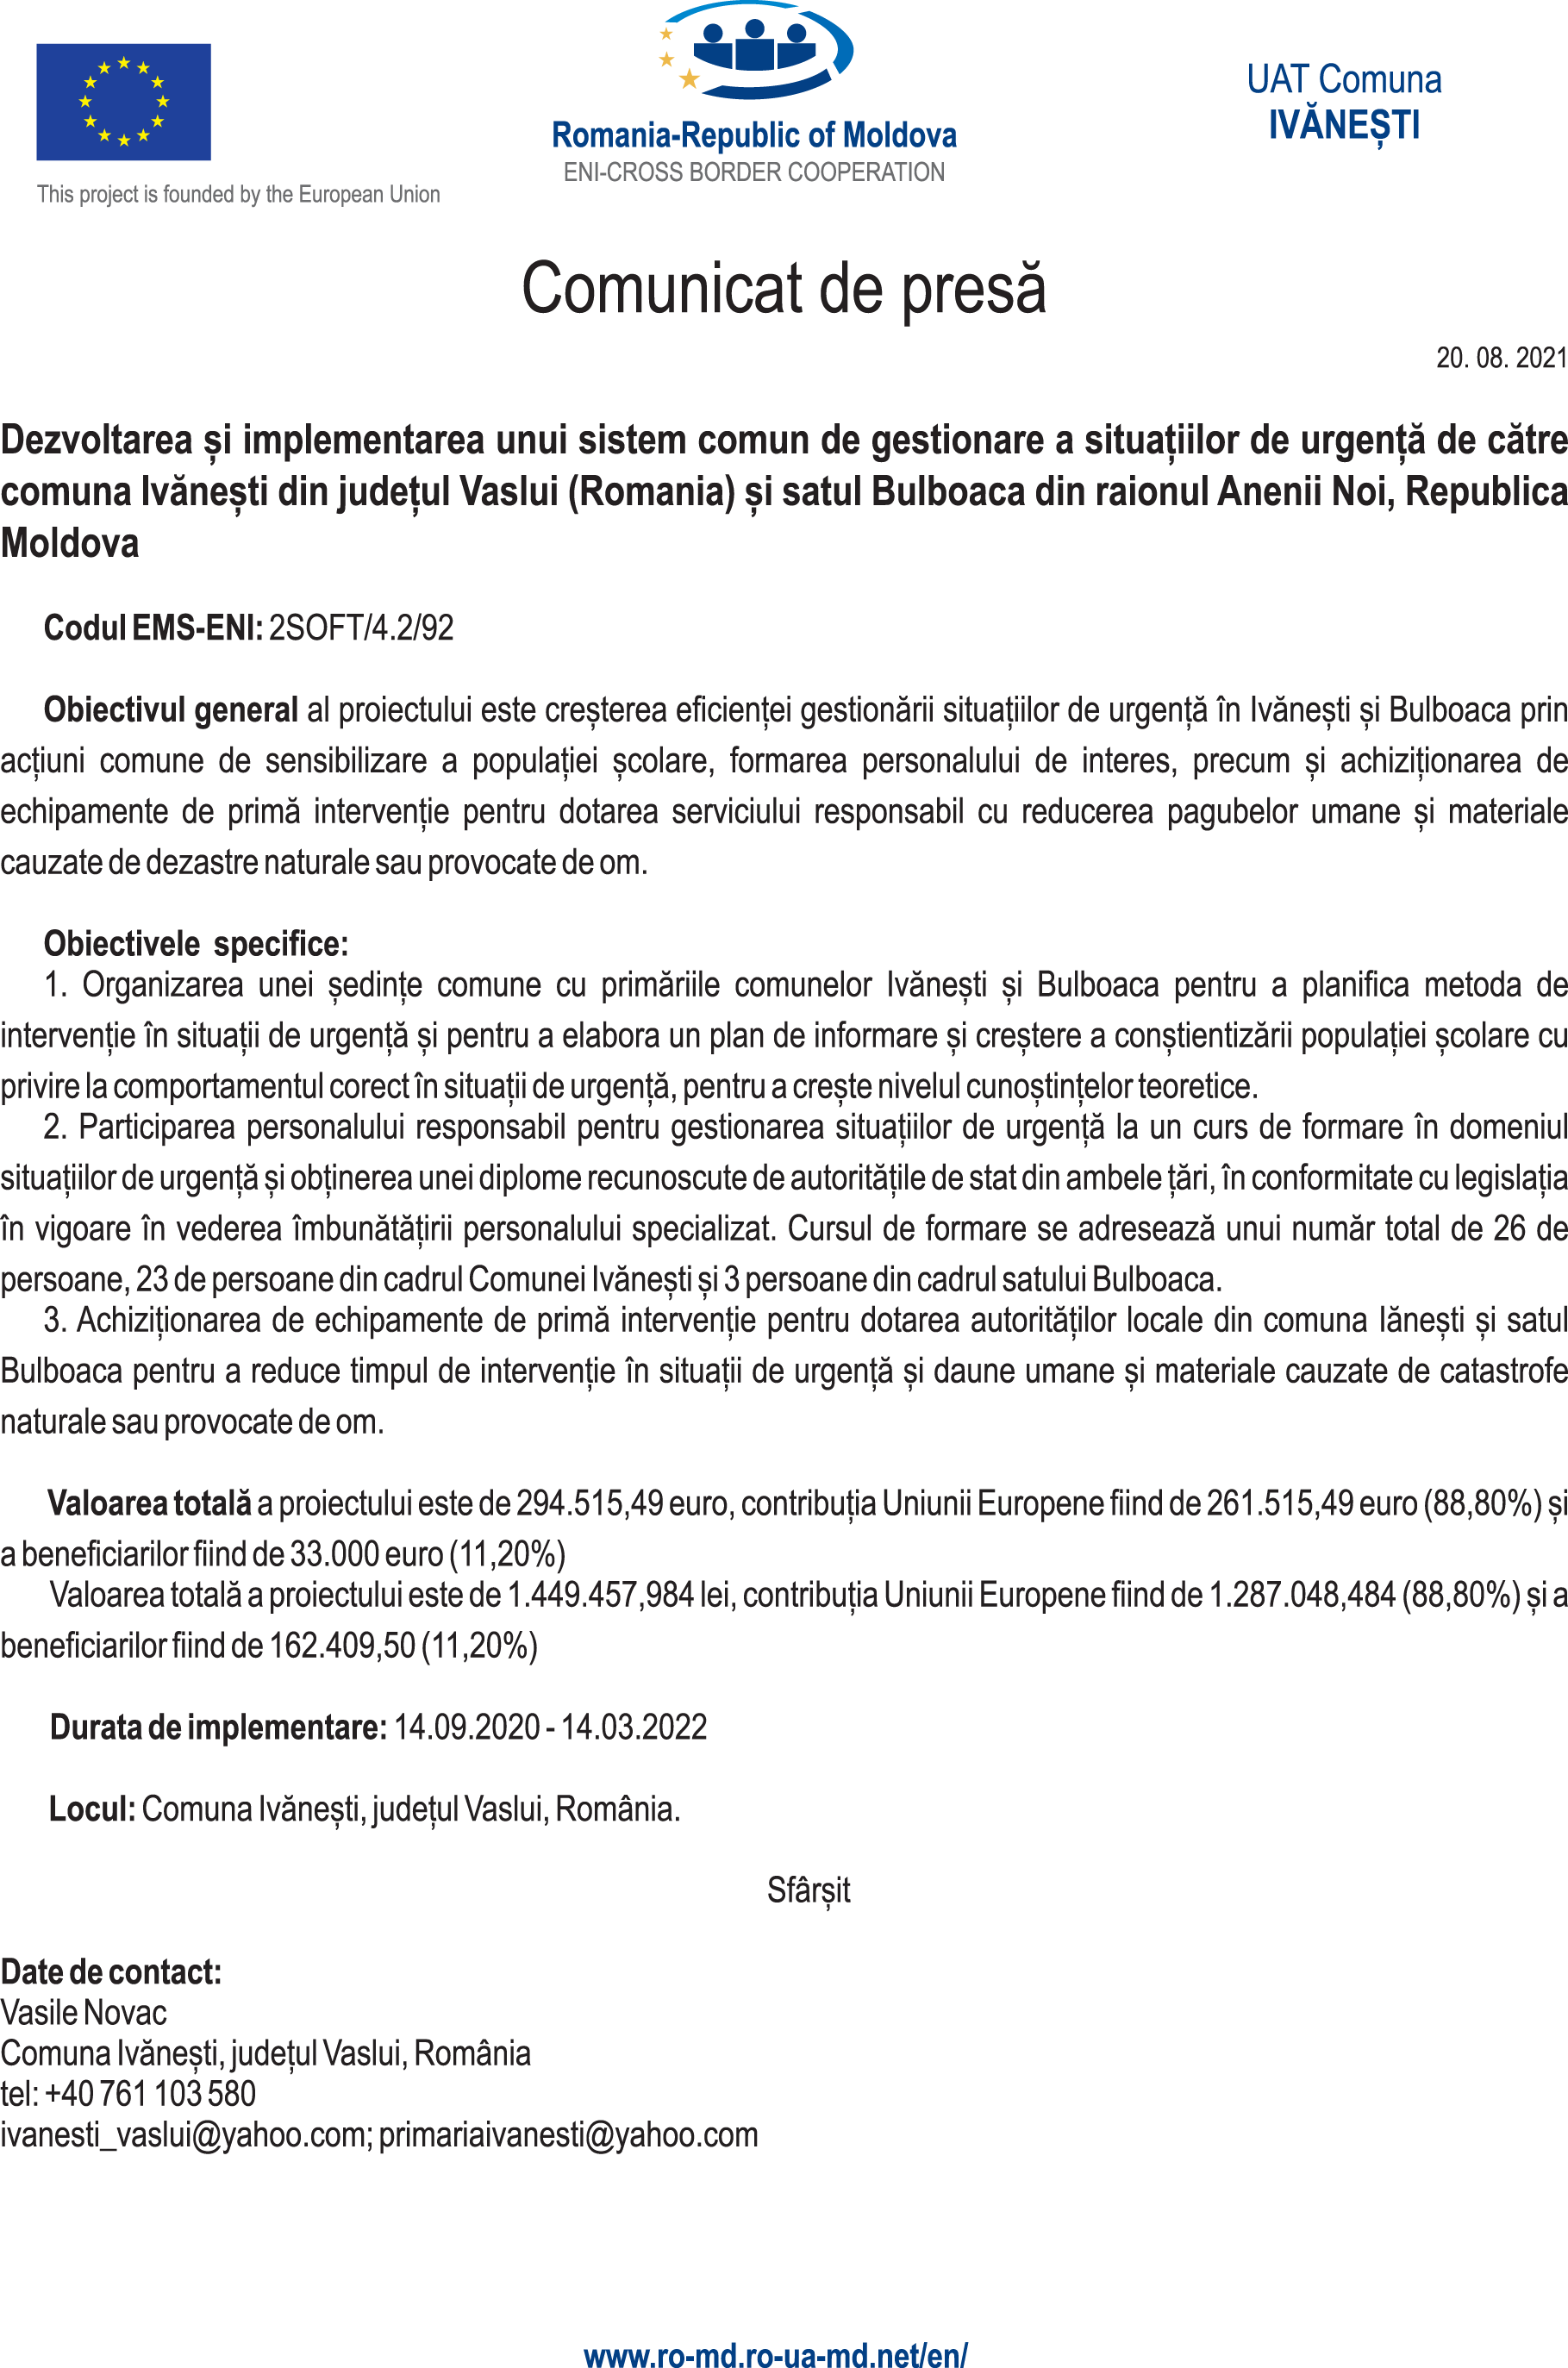 comunicat-de-presa-Ivanesti-RO-20